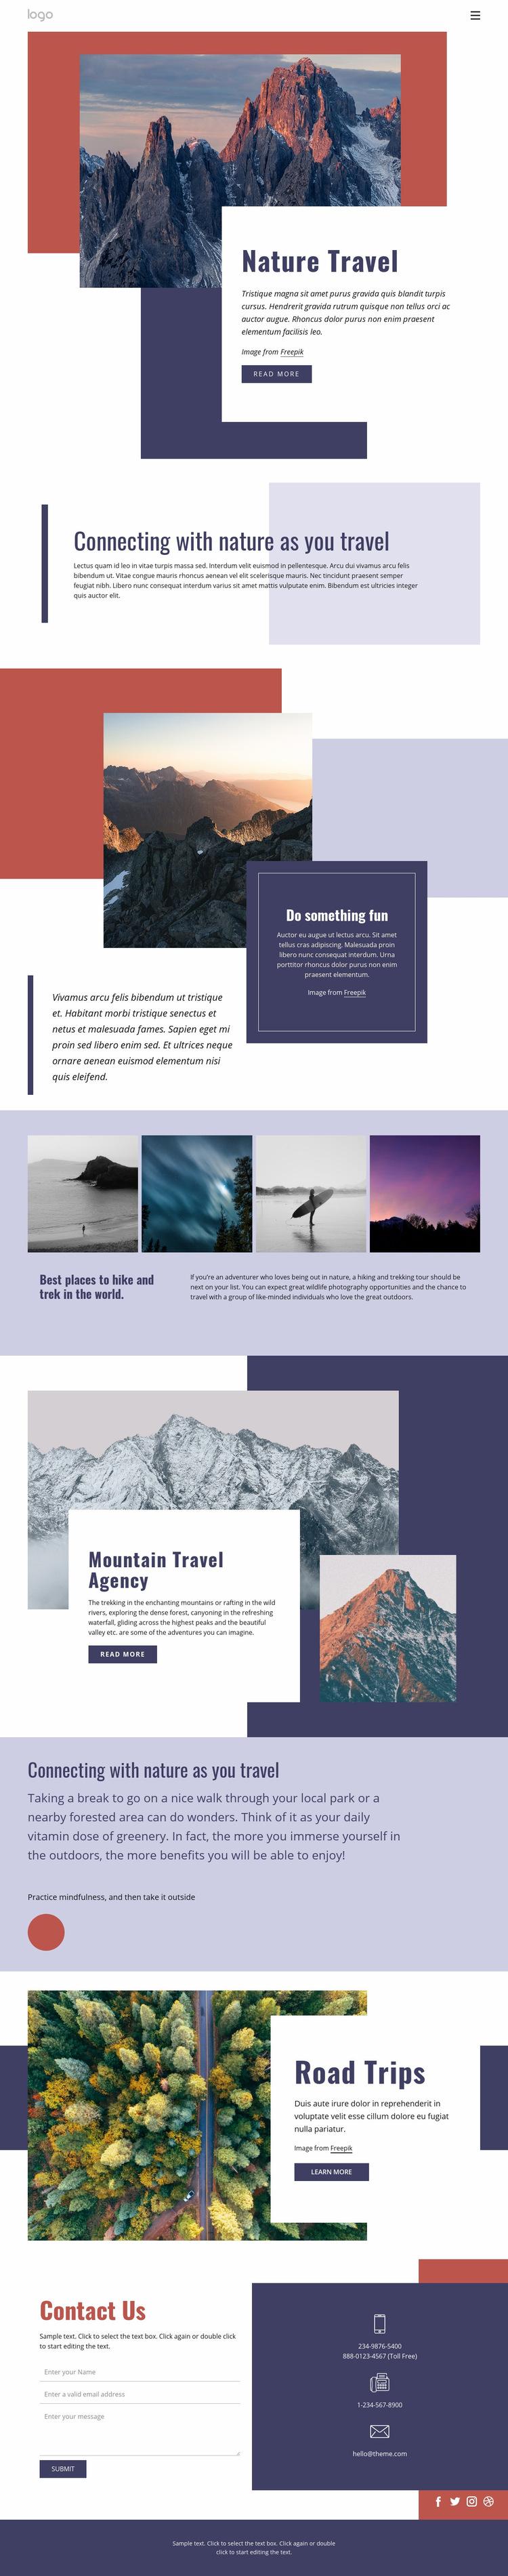 Nature travel Web Page Design